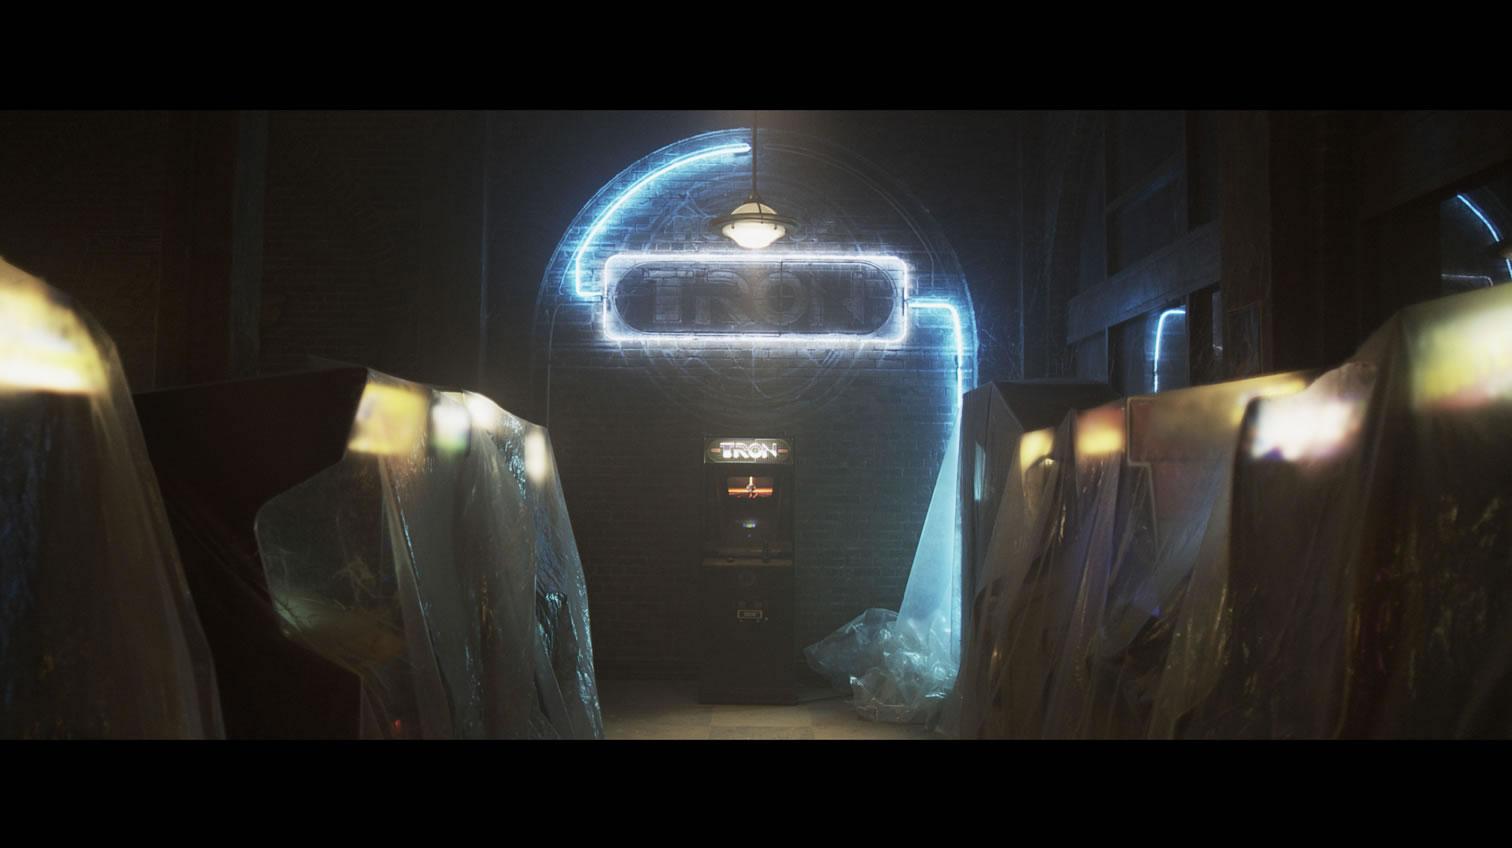 Tron_in_Flynn's_Arcade_jpg_jpg.jpg